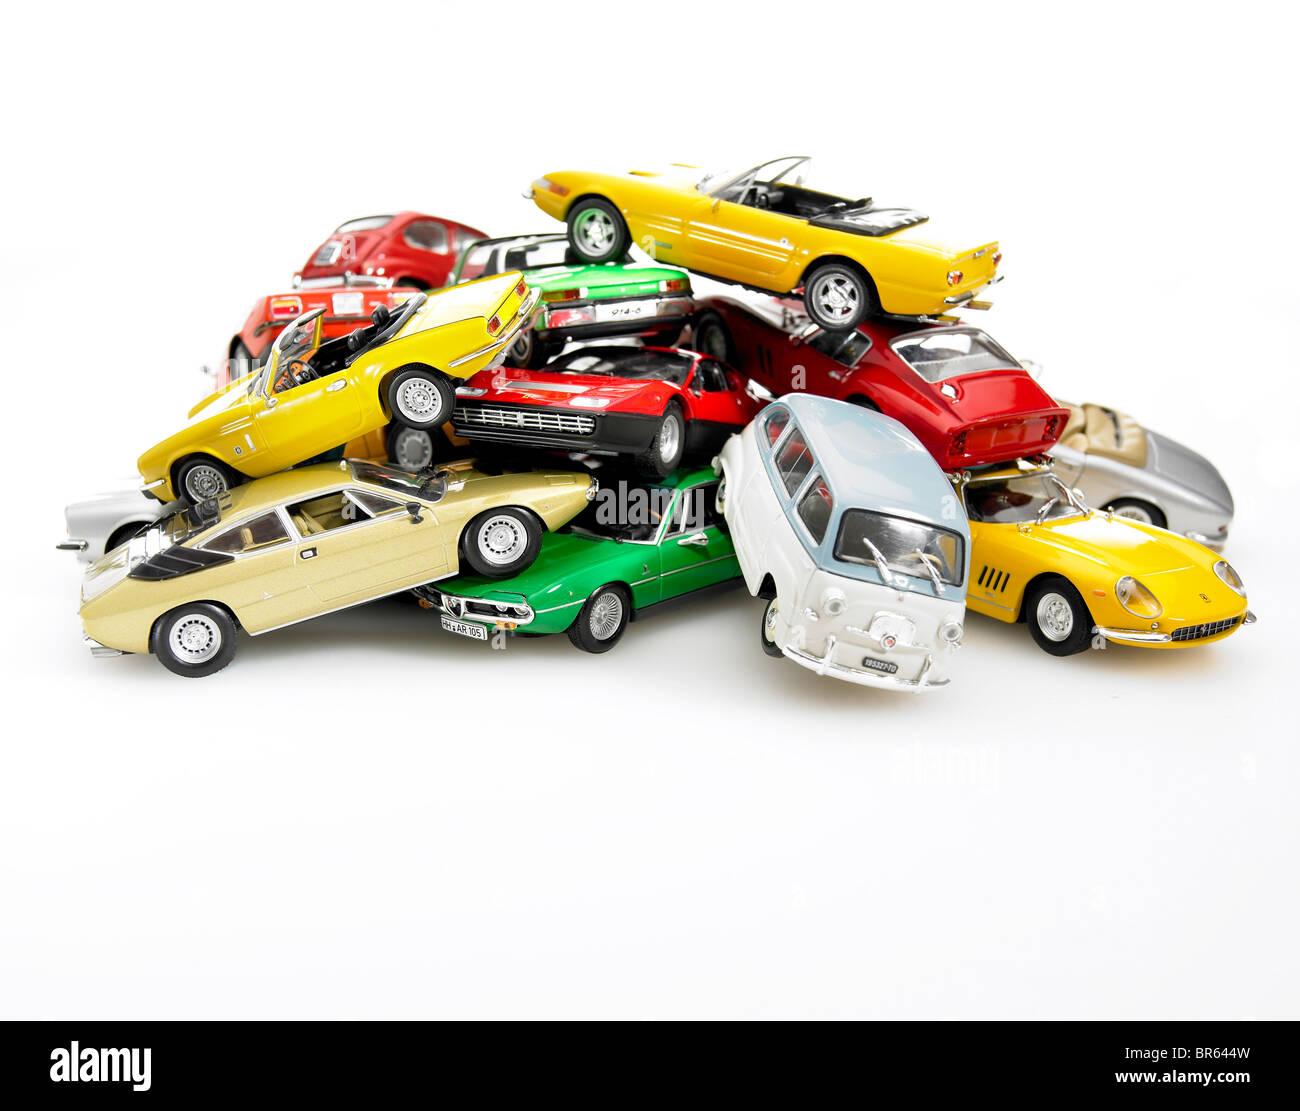 Pile of miniature model cars. - Stock Image